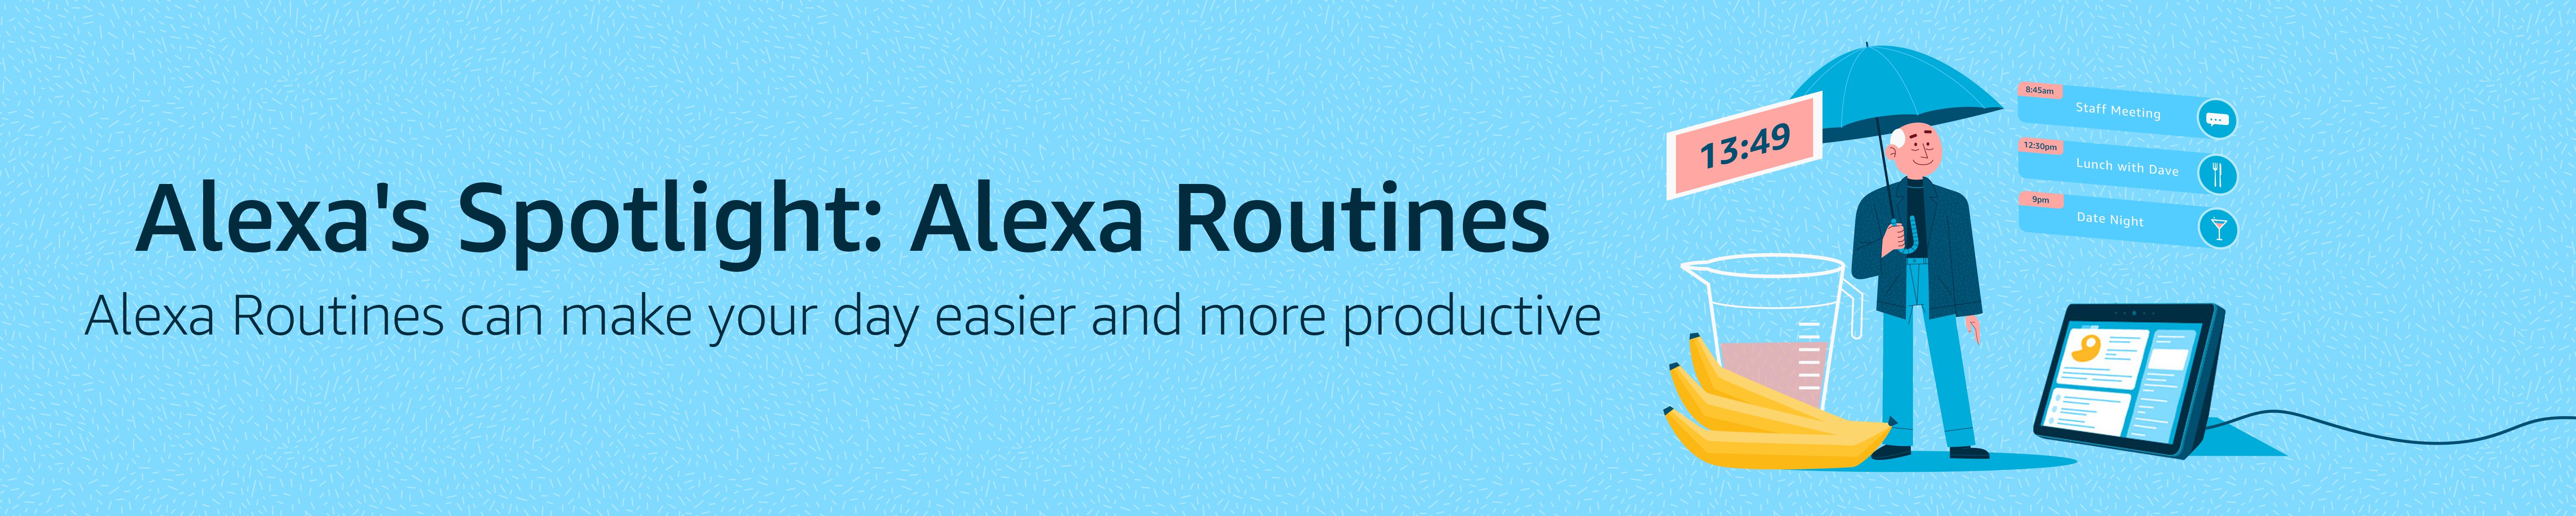 Alexa's Spotlight: Alexa Routines